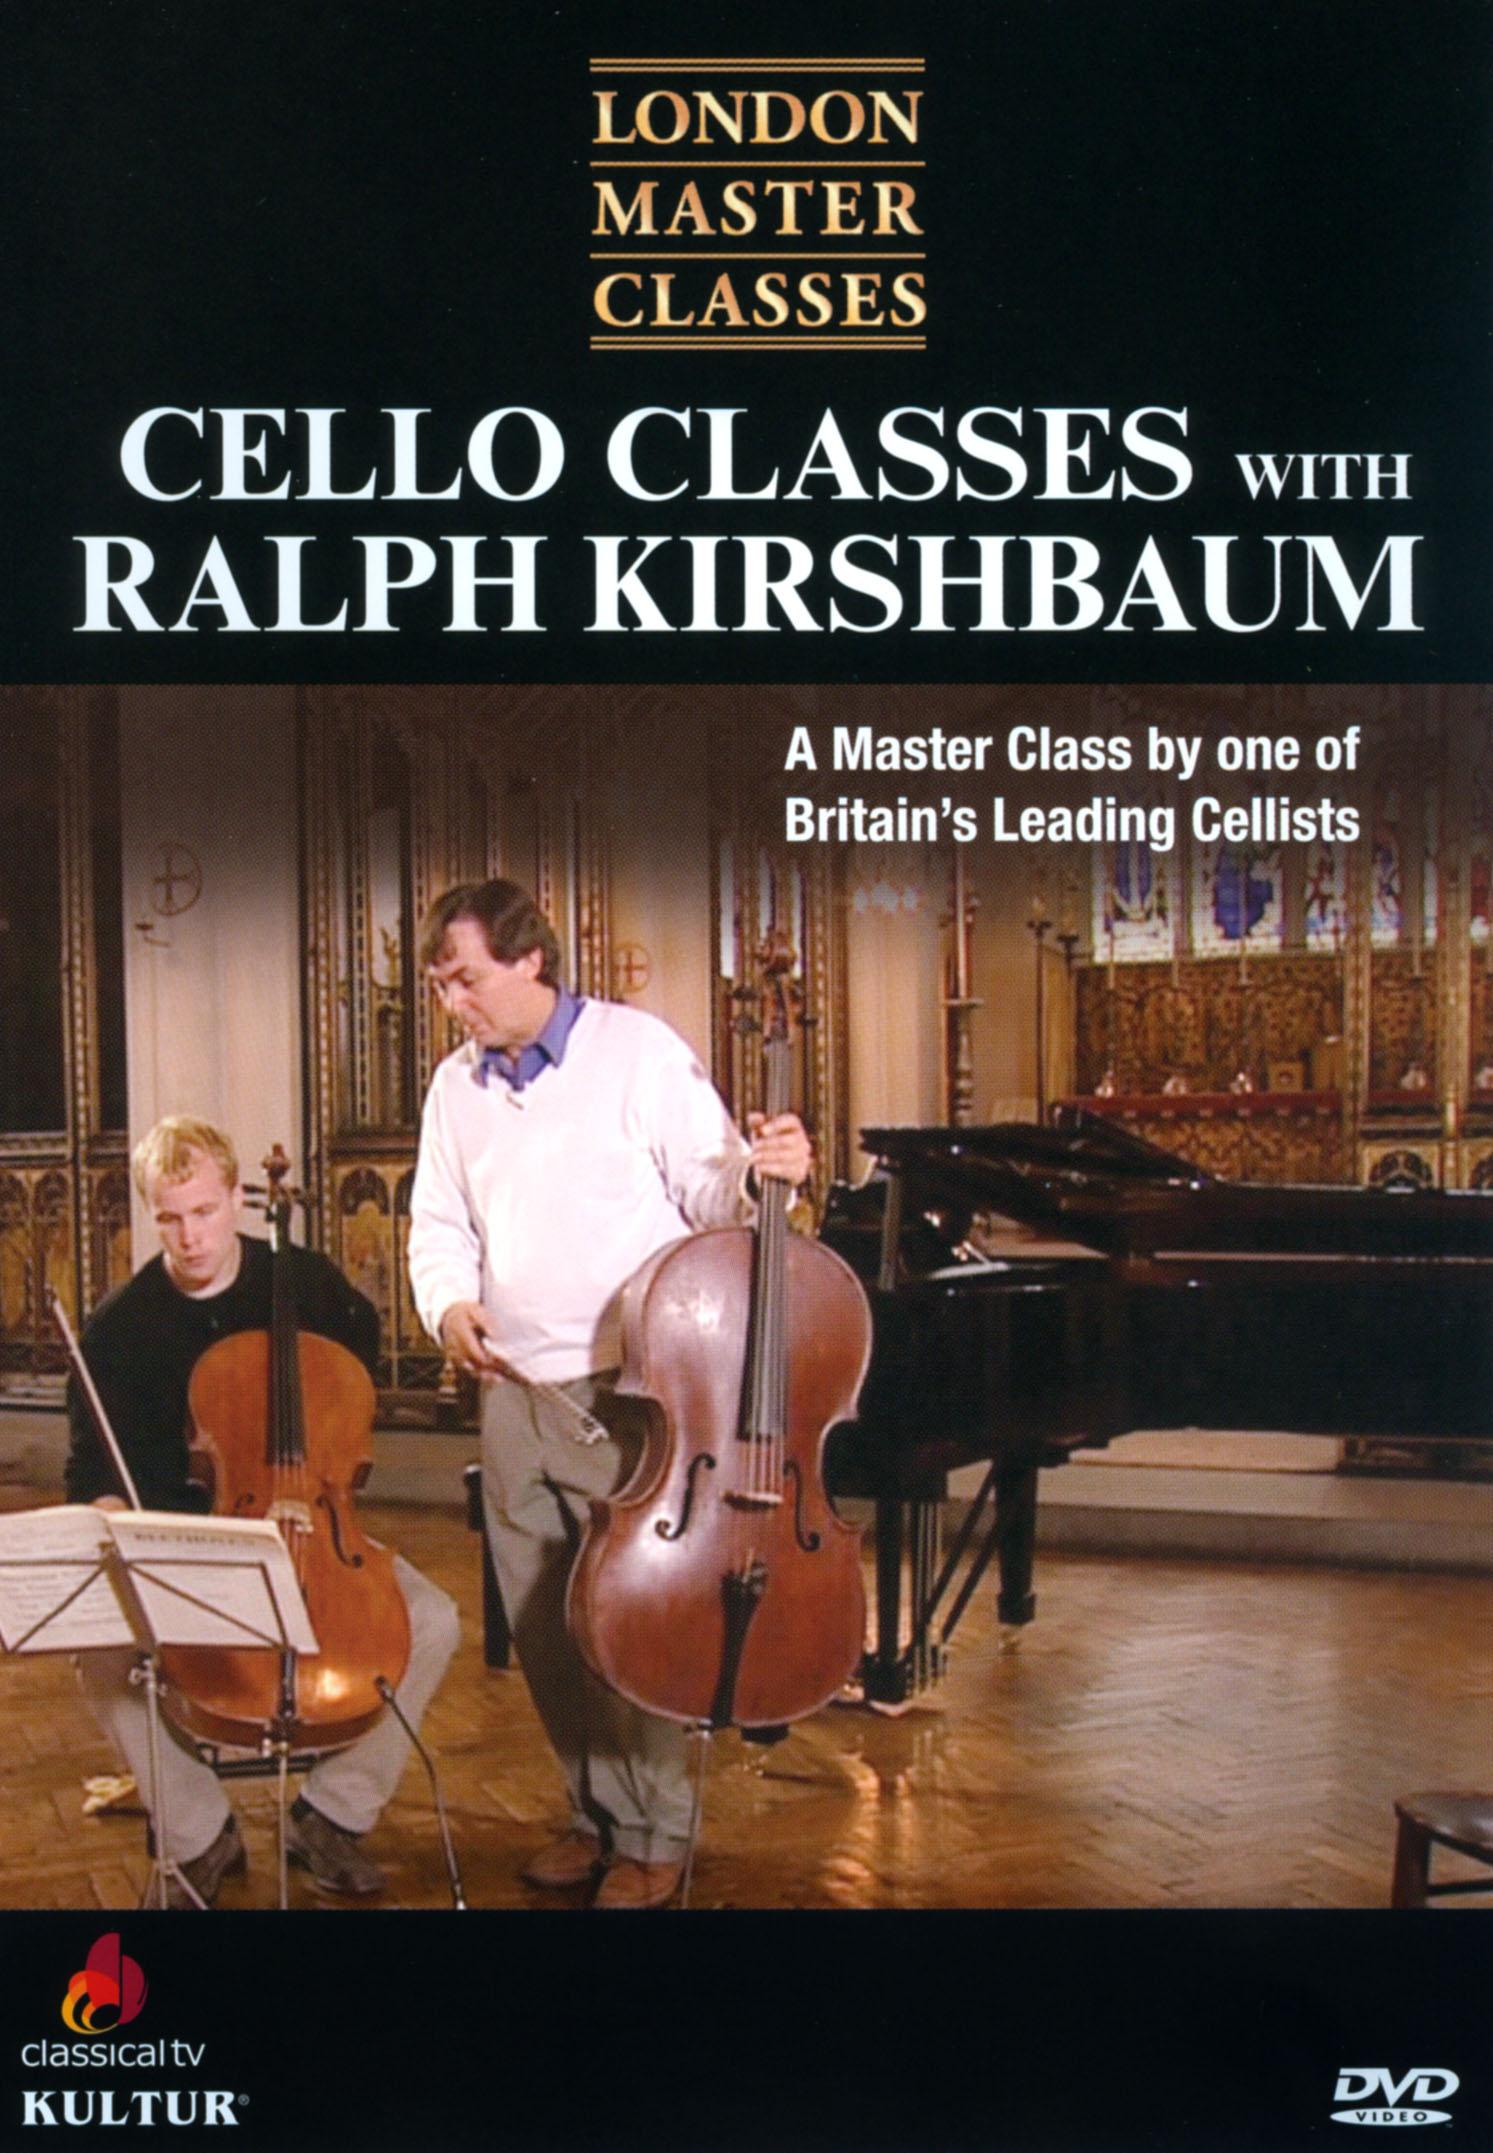 London Master Classes: Cello Classes with Ralph Kirshbaum